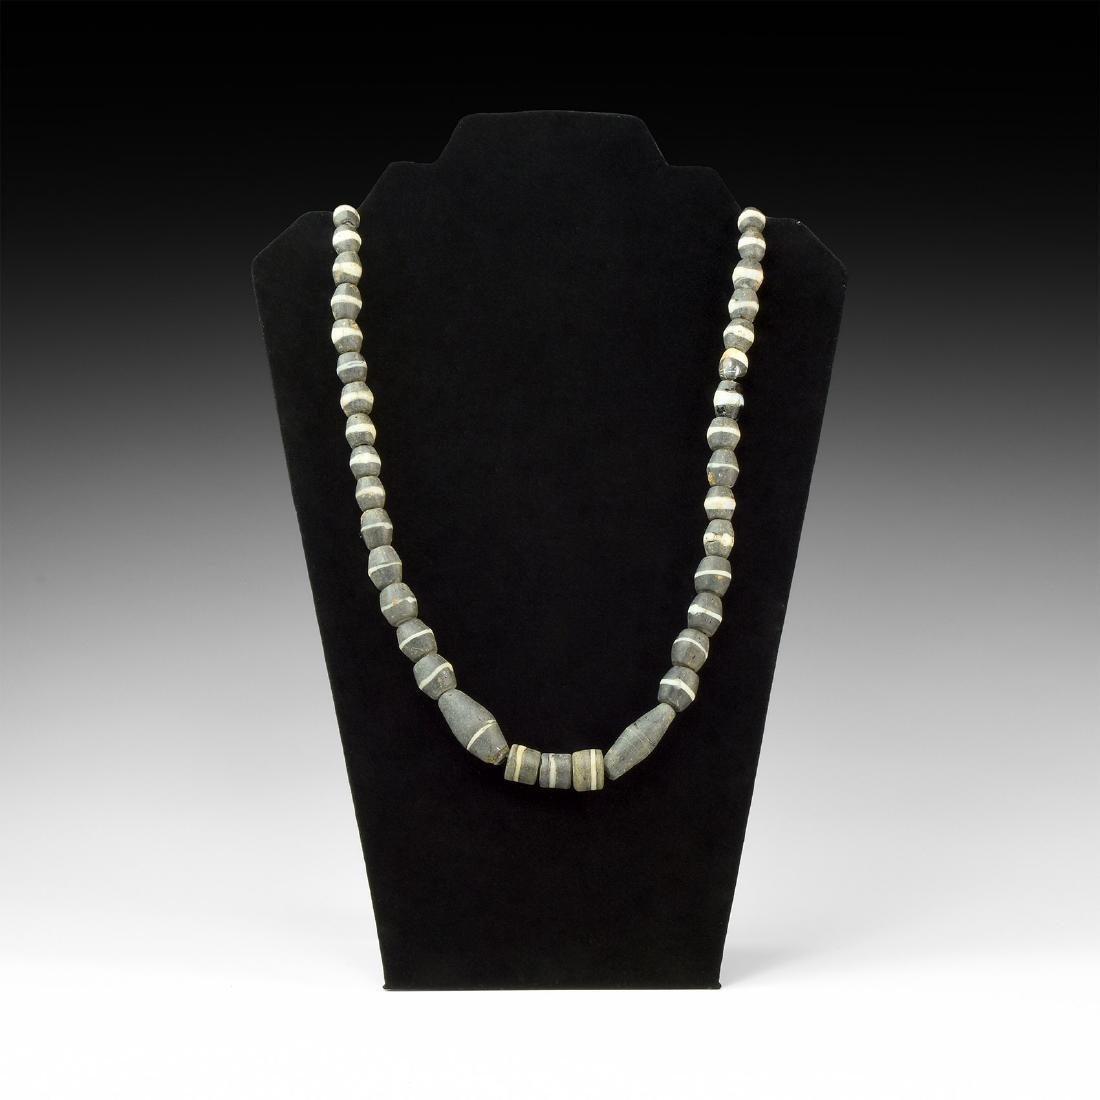 Roman or Parthian Bead Necklace